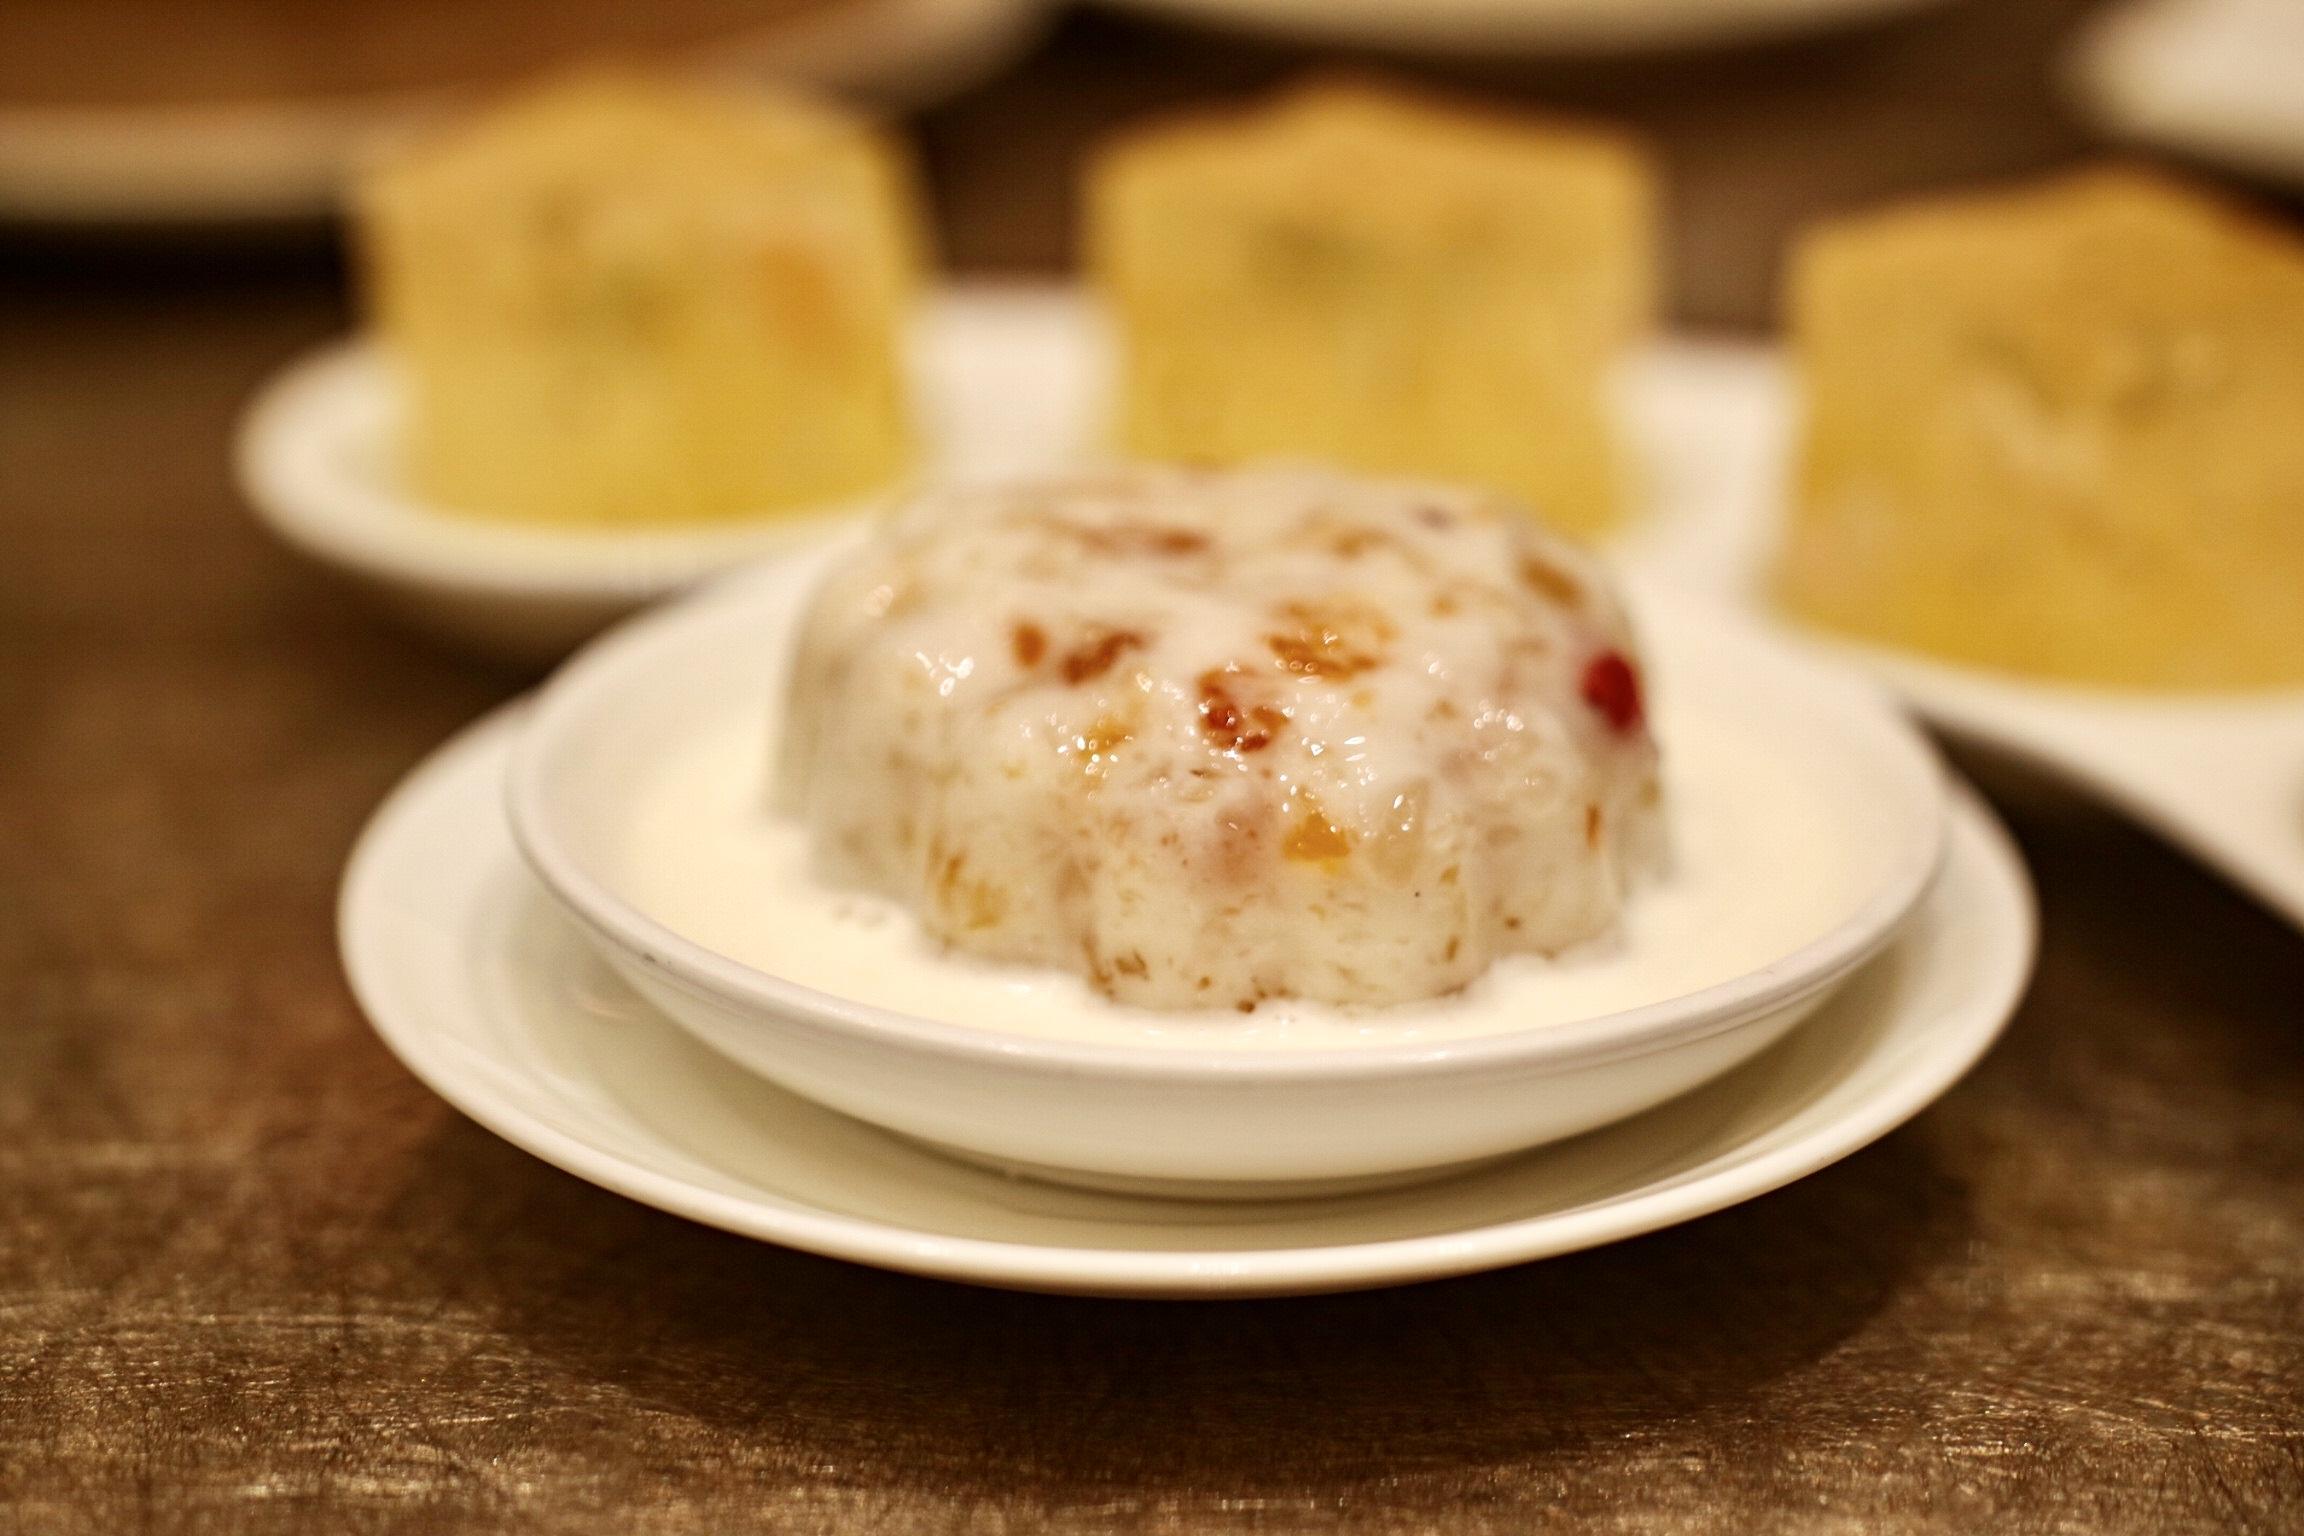 Peach Resin Cake (養顏清甜桃膠糕)